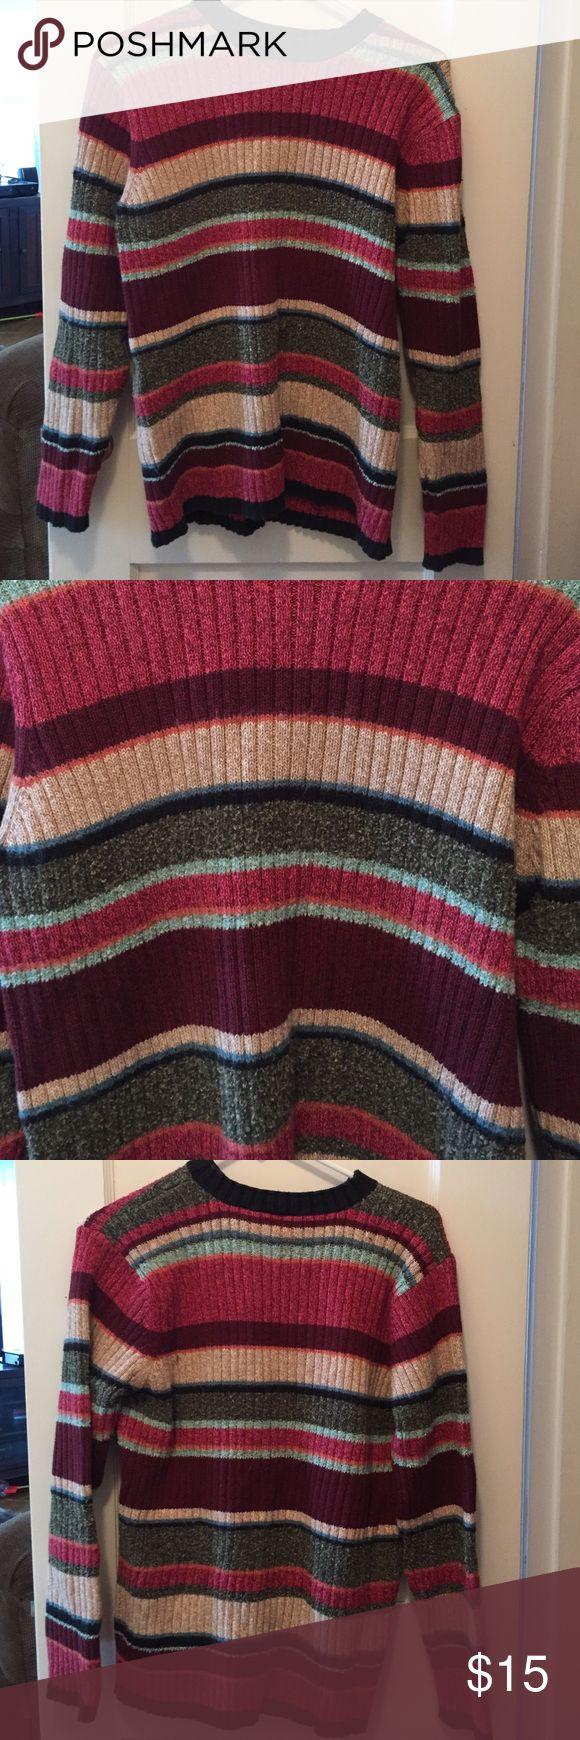 "Liz Claiborne Lizsport Petite Sweater Striped sweater. Petite large. Chest 18"" Length 24"" Liz Claiborne Sweaters"